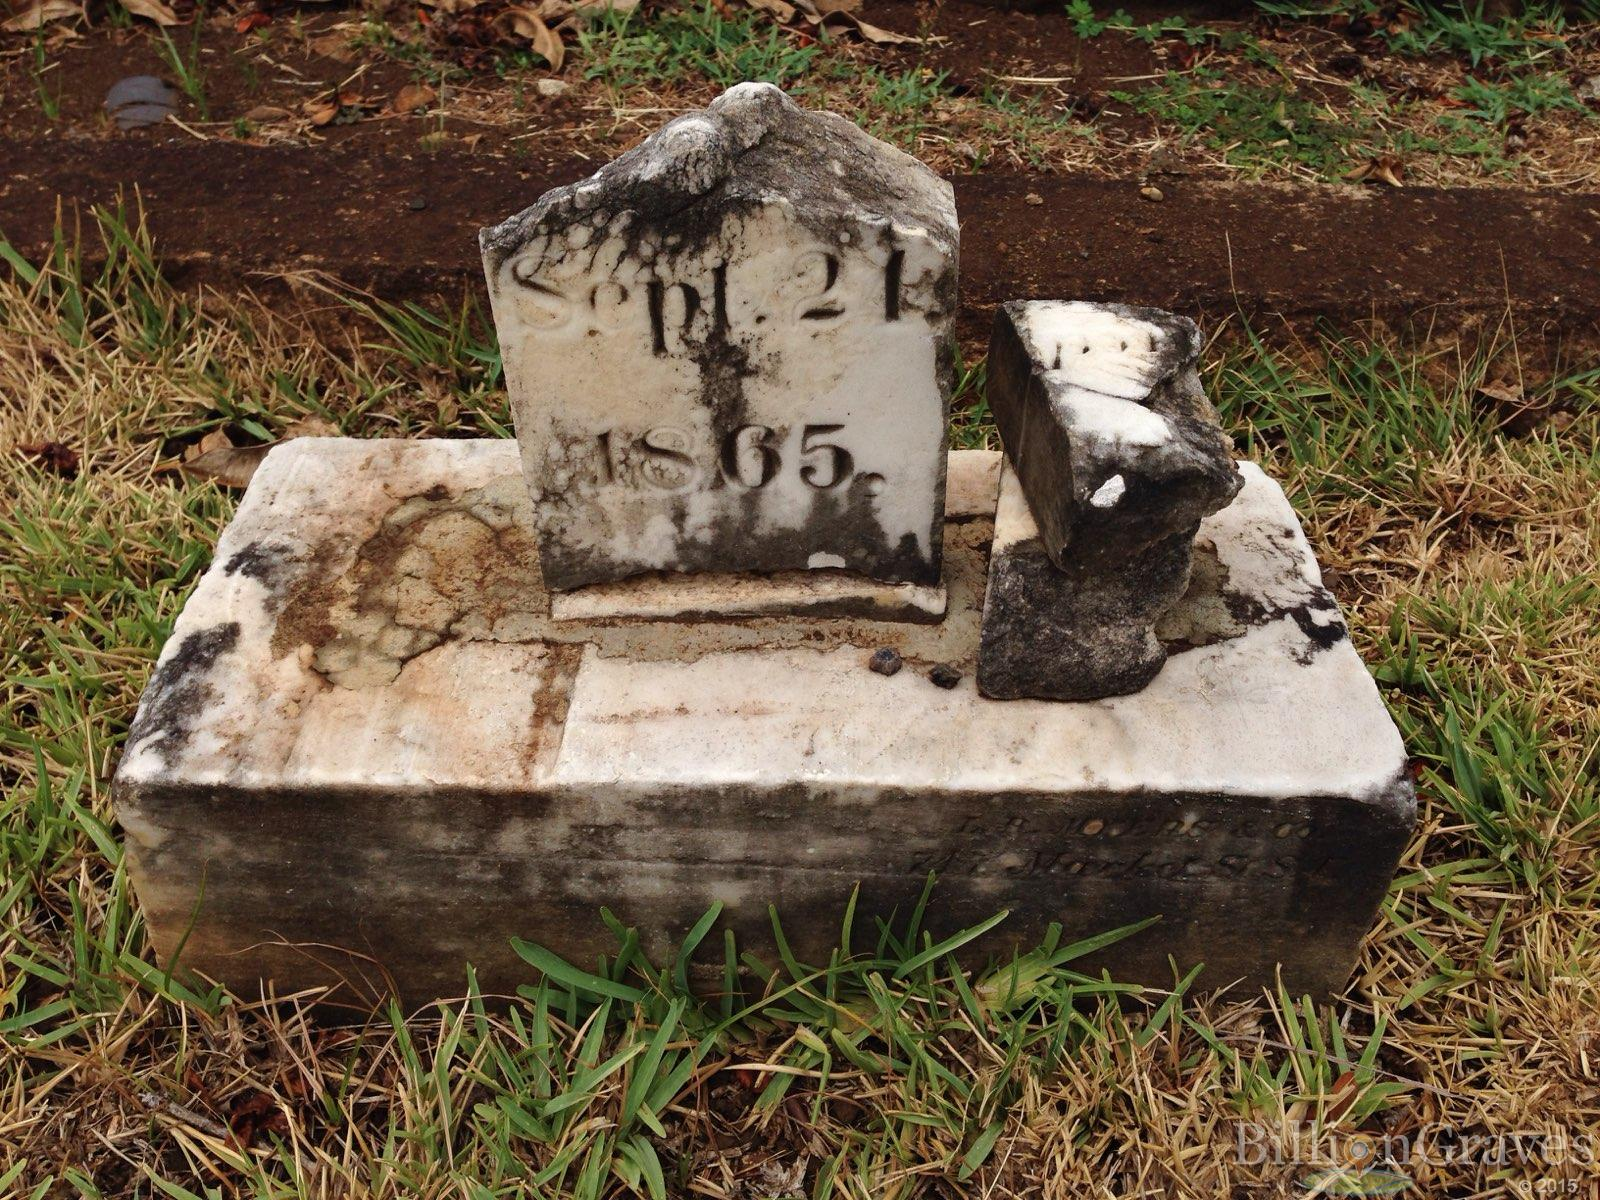 BillionGraves, gravestone, grave, damaged gravestones, cemetery, family history, ancestors, community service project, JustServe, BillionGraves app, ivy, plant growth, JustServe, marble grave